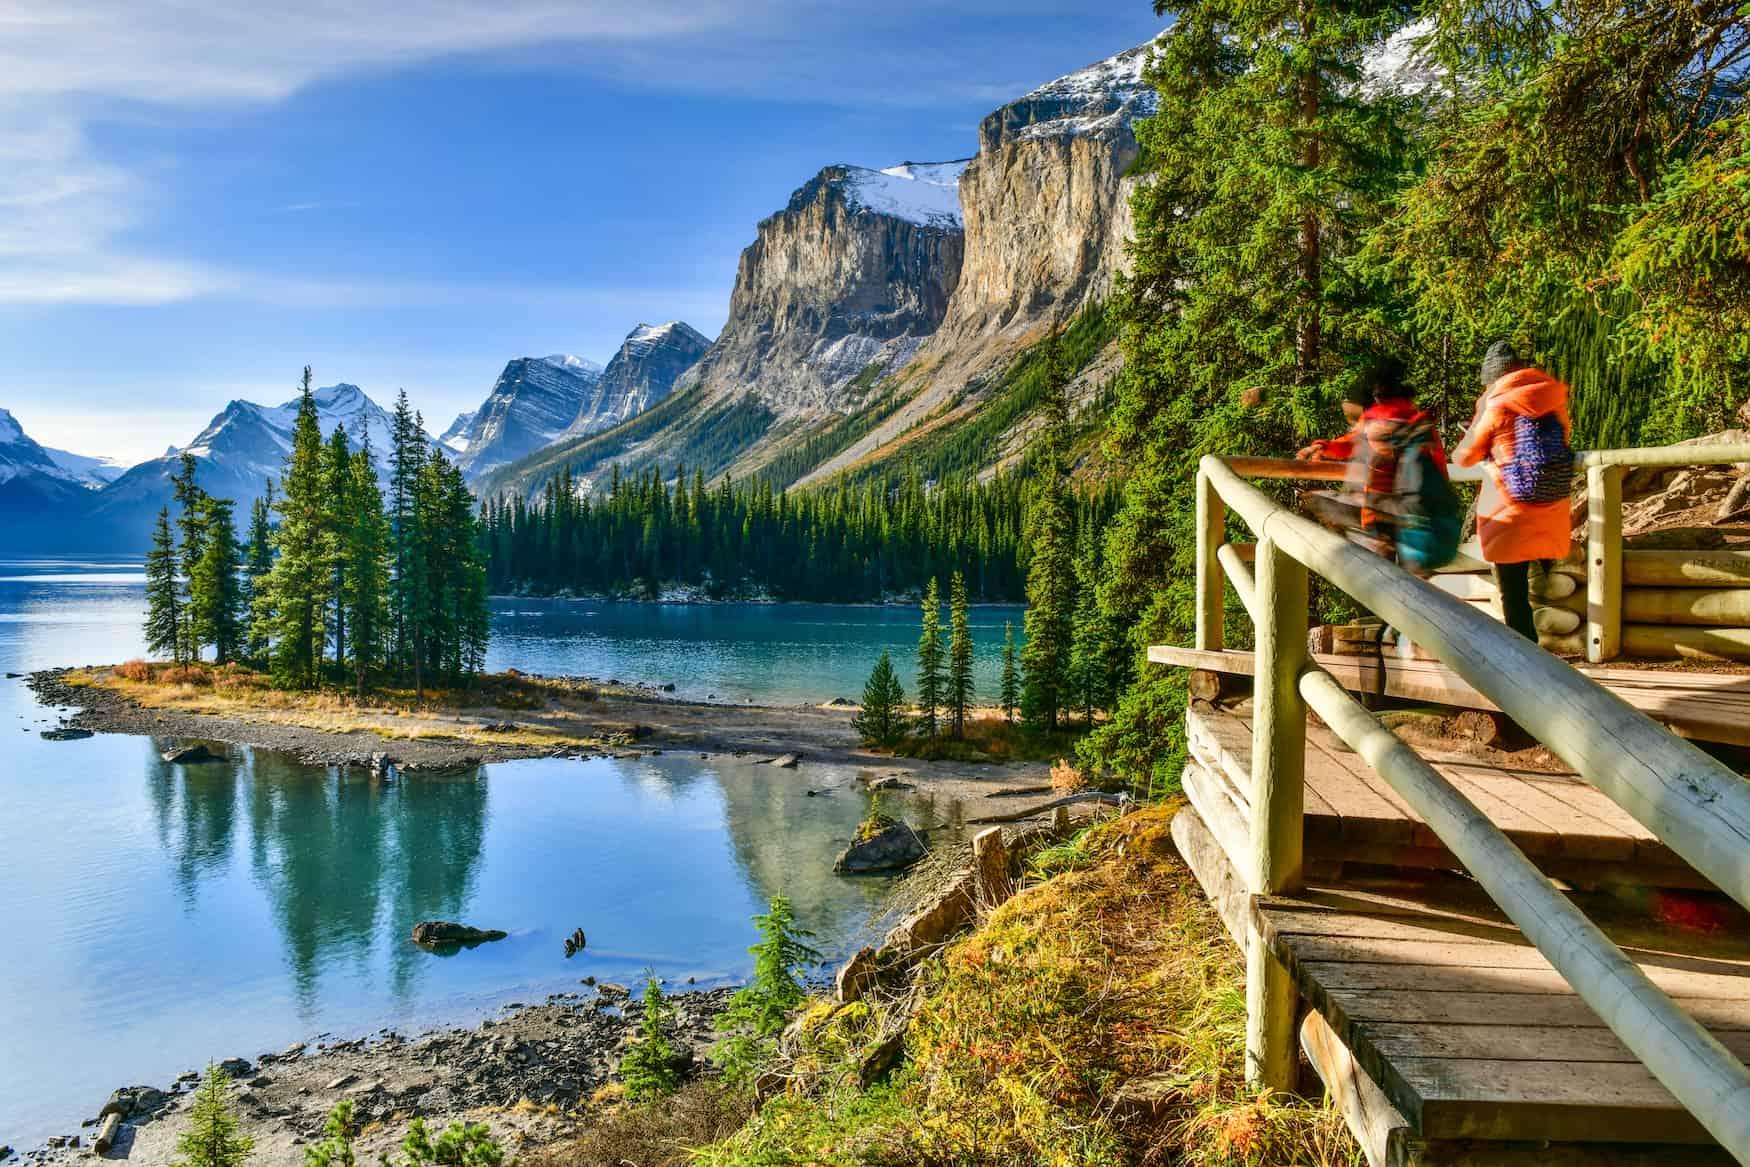 Aussicht auf den Maligne Lake, Jasper National Park, Alberta